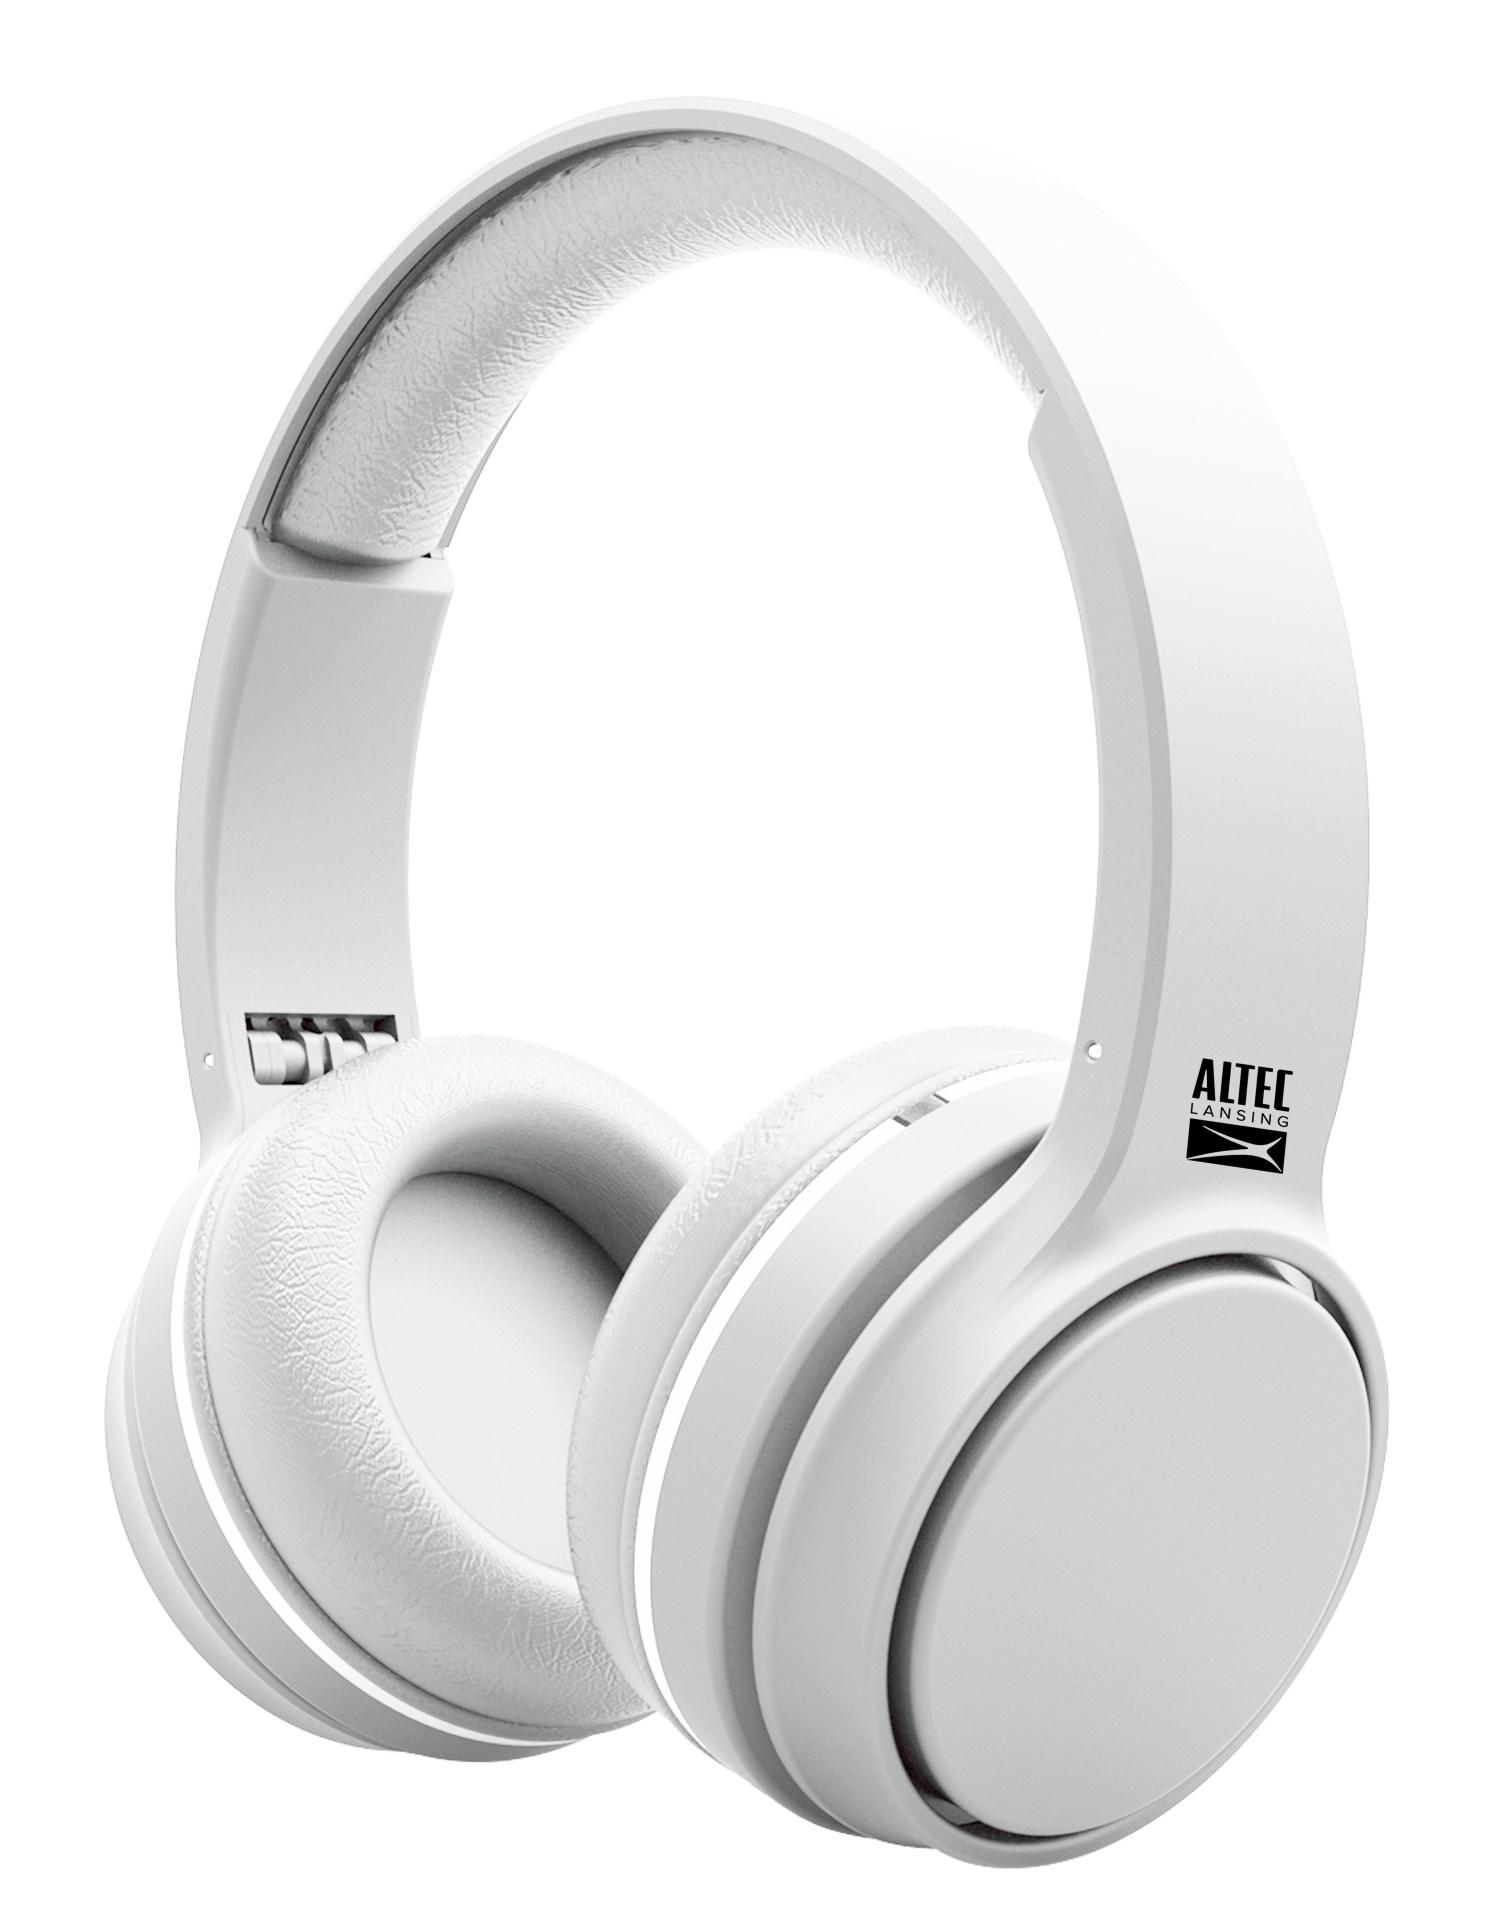 ALTEC LANSING headphones Ring, ενσύρματα, 110dB, 40mm, λευκά - ALTEC 21742